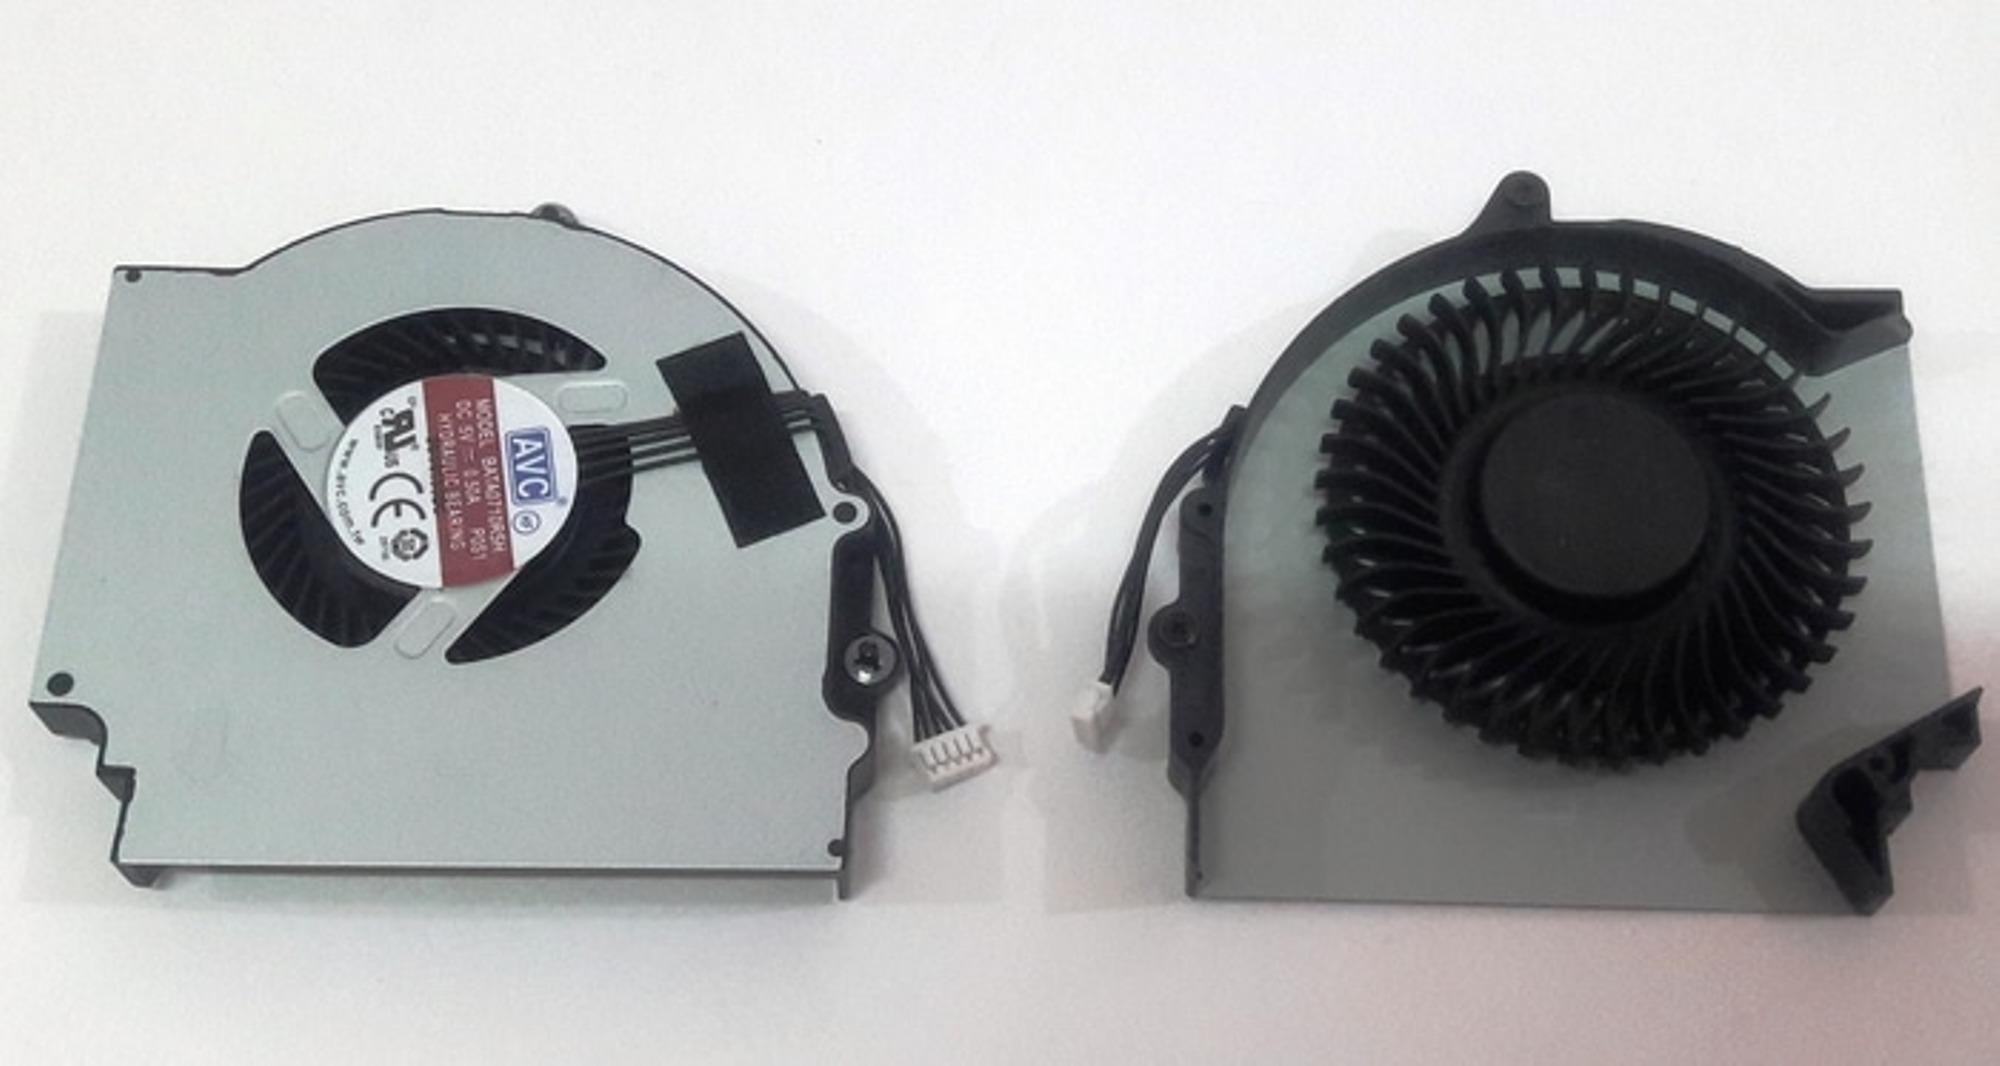 Fan Processor Lenovo Thinkpad E531 E431 E440 E540